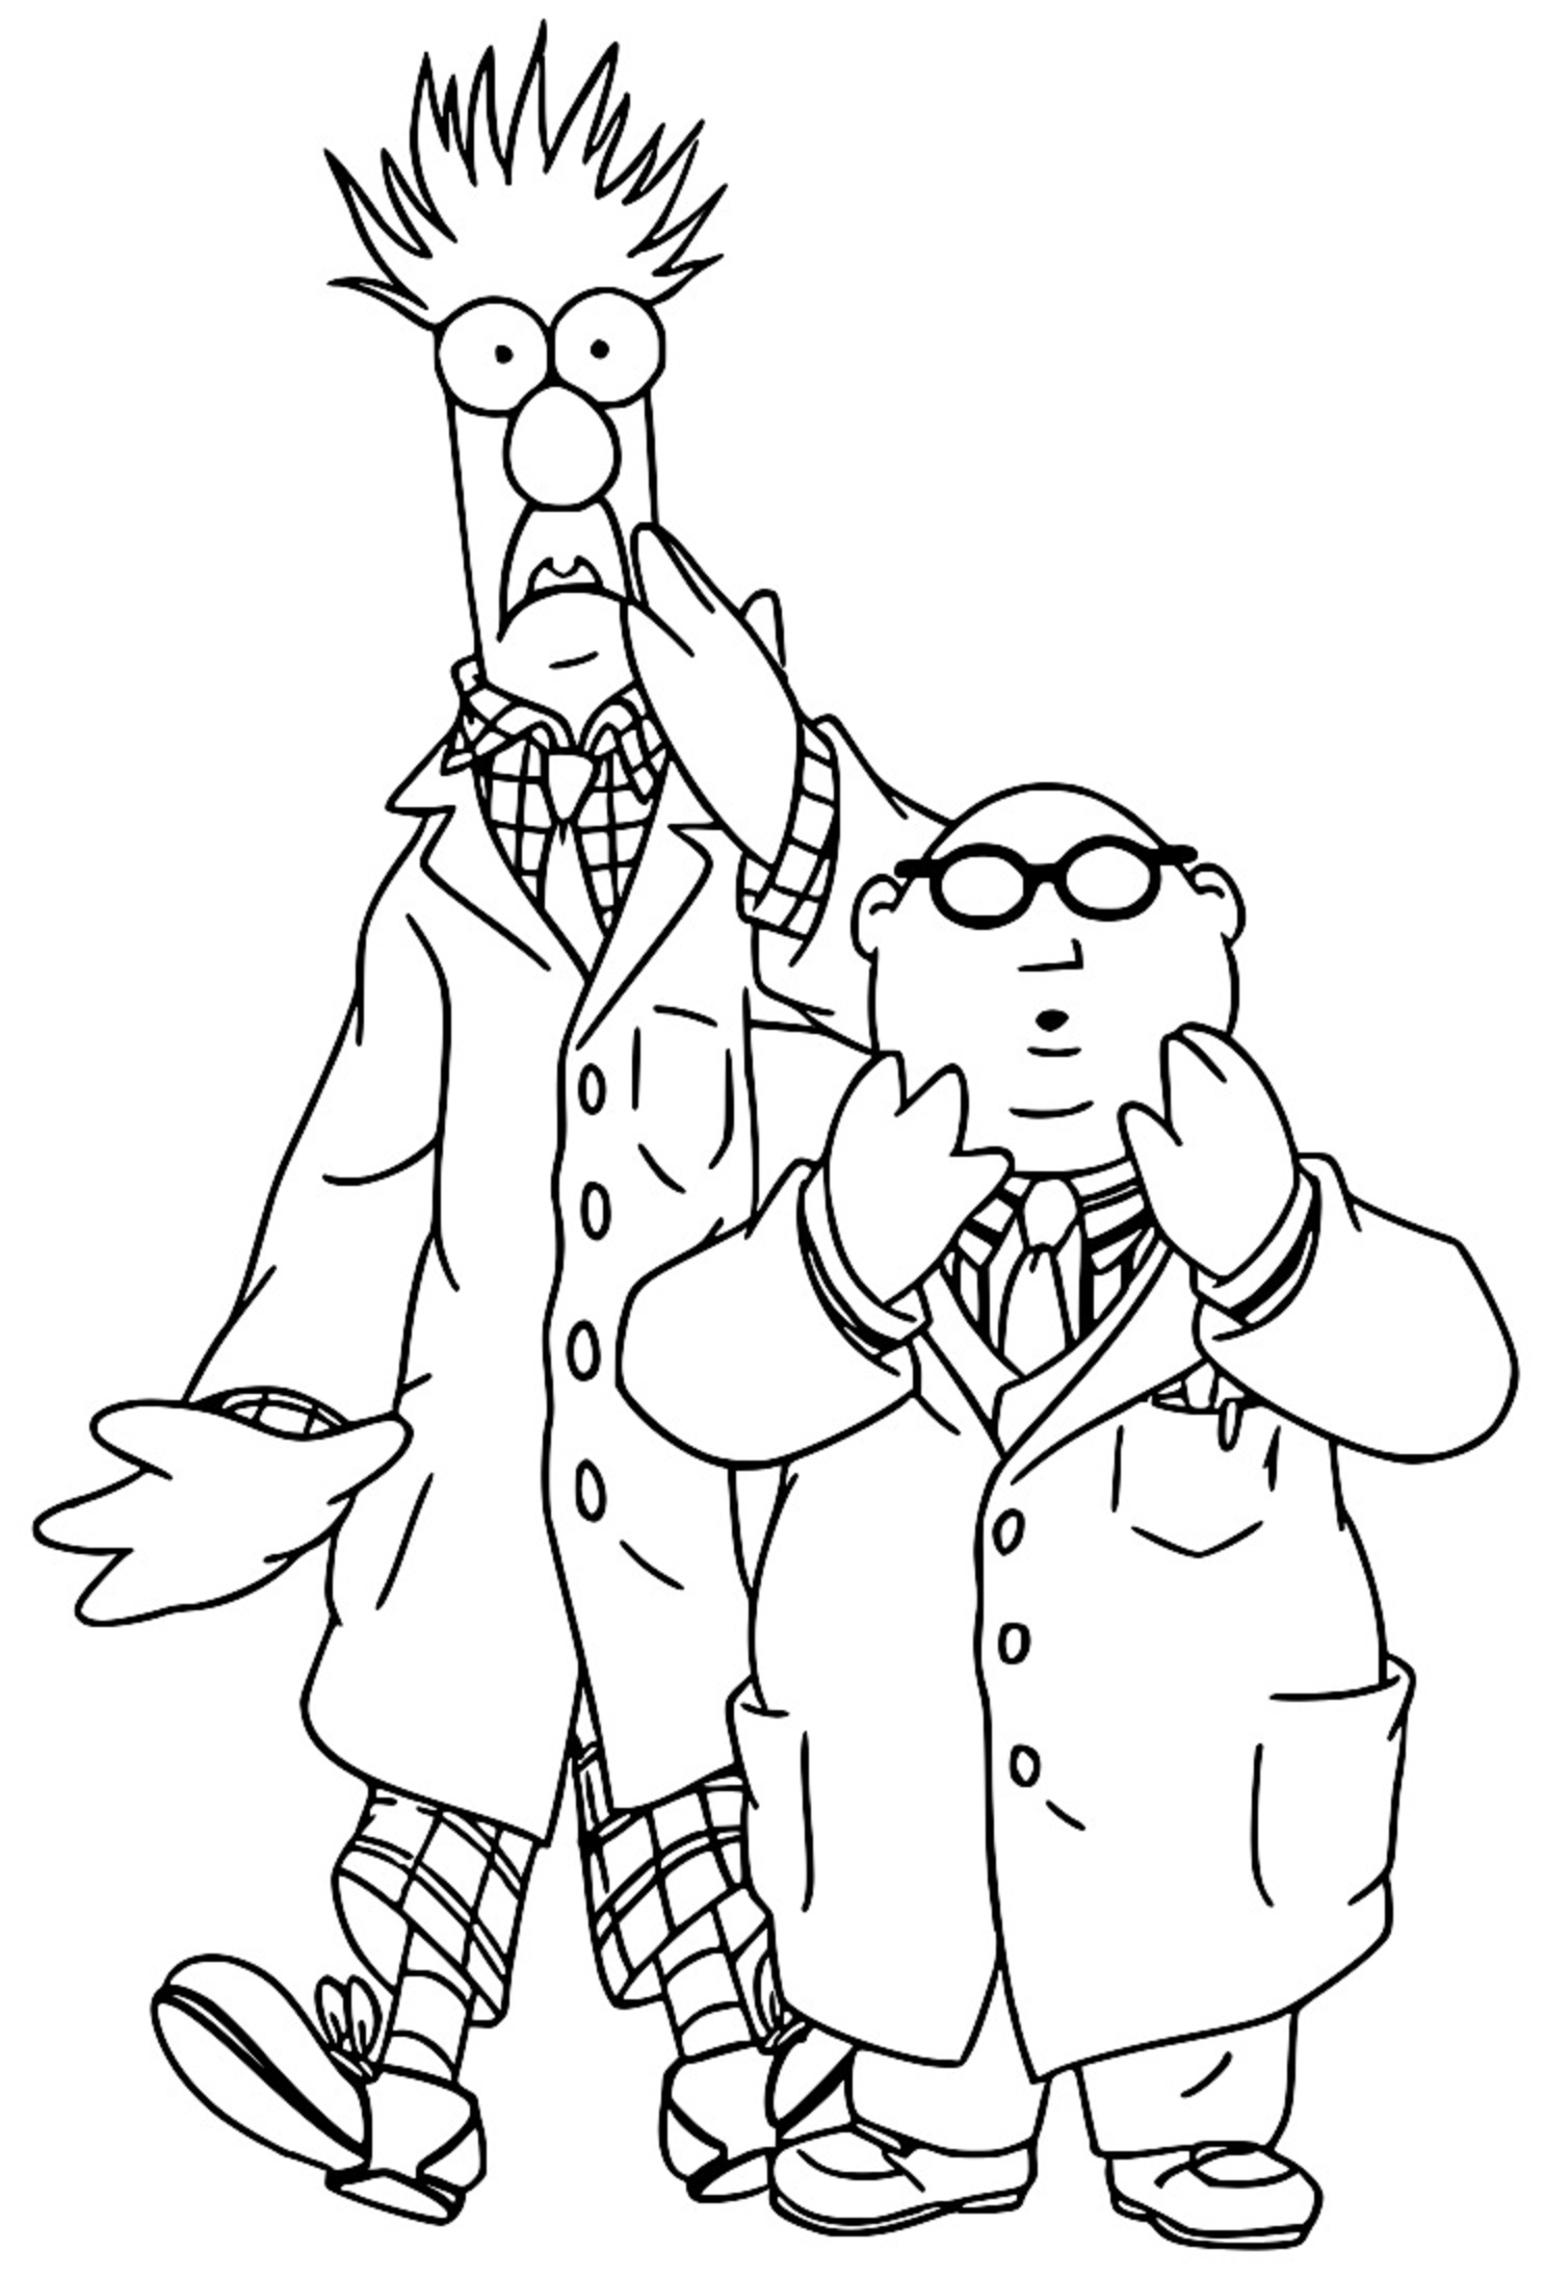 The Muppets beaker bunsen honeydew Cartoon Coloring Page